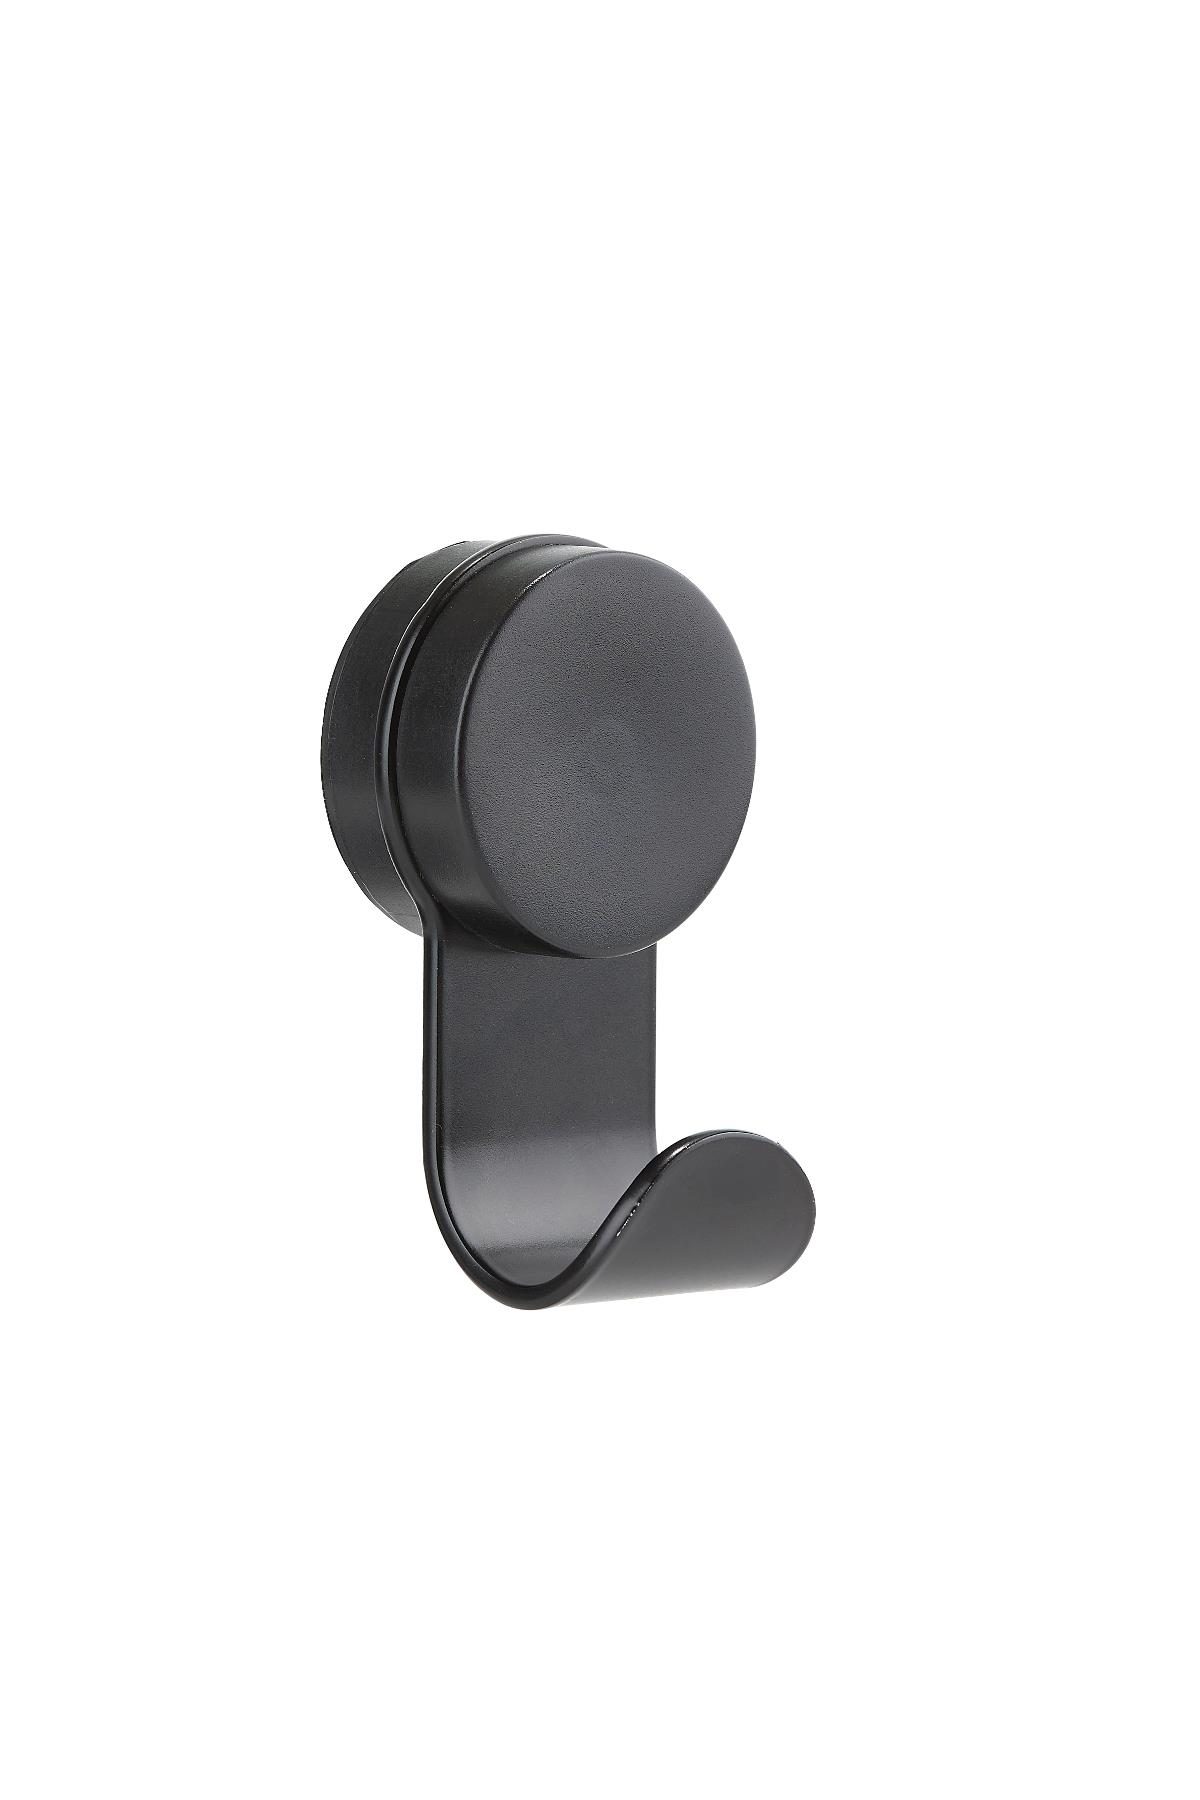 Zone - Puck Hook Single - Black (330253)